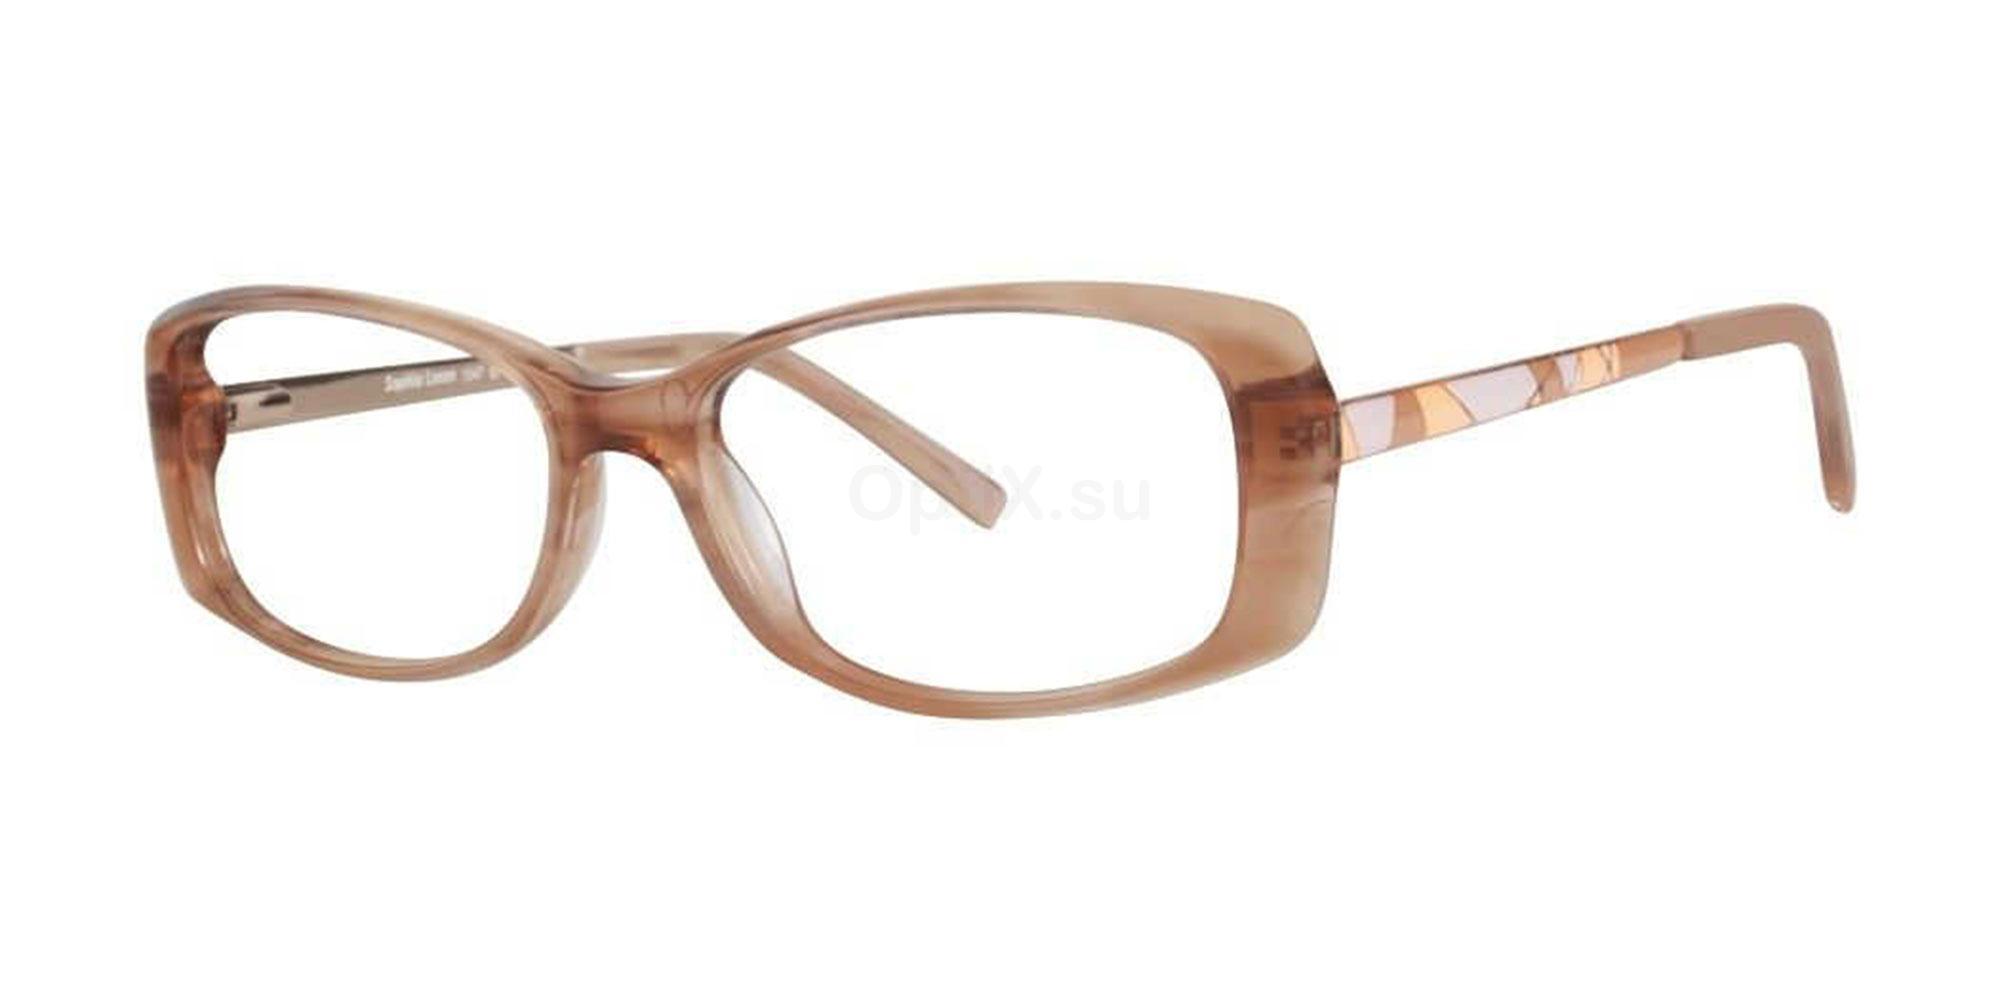 01 SL1547 Glasses, Sophia Loren